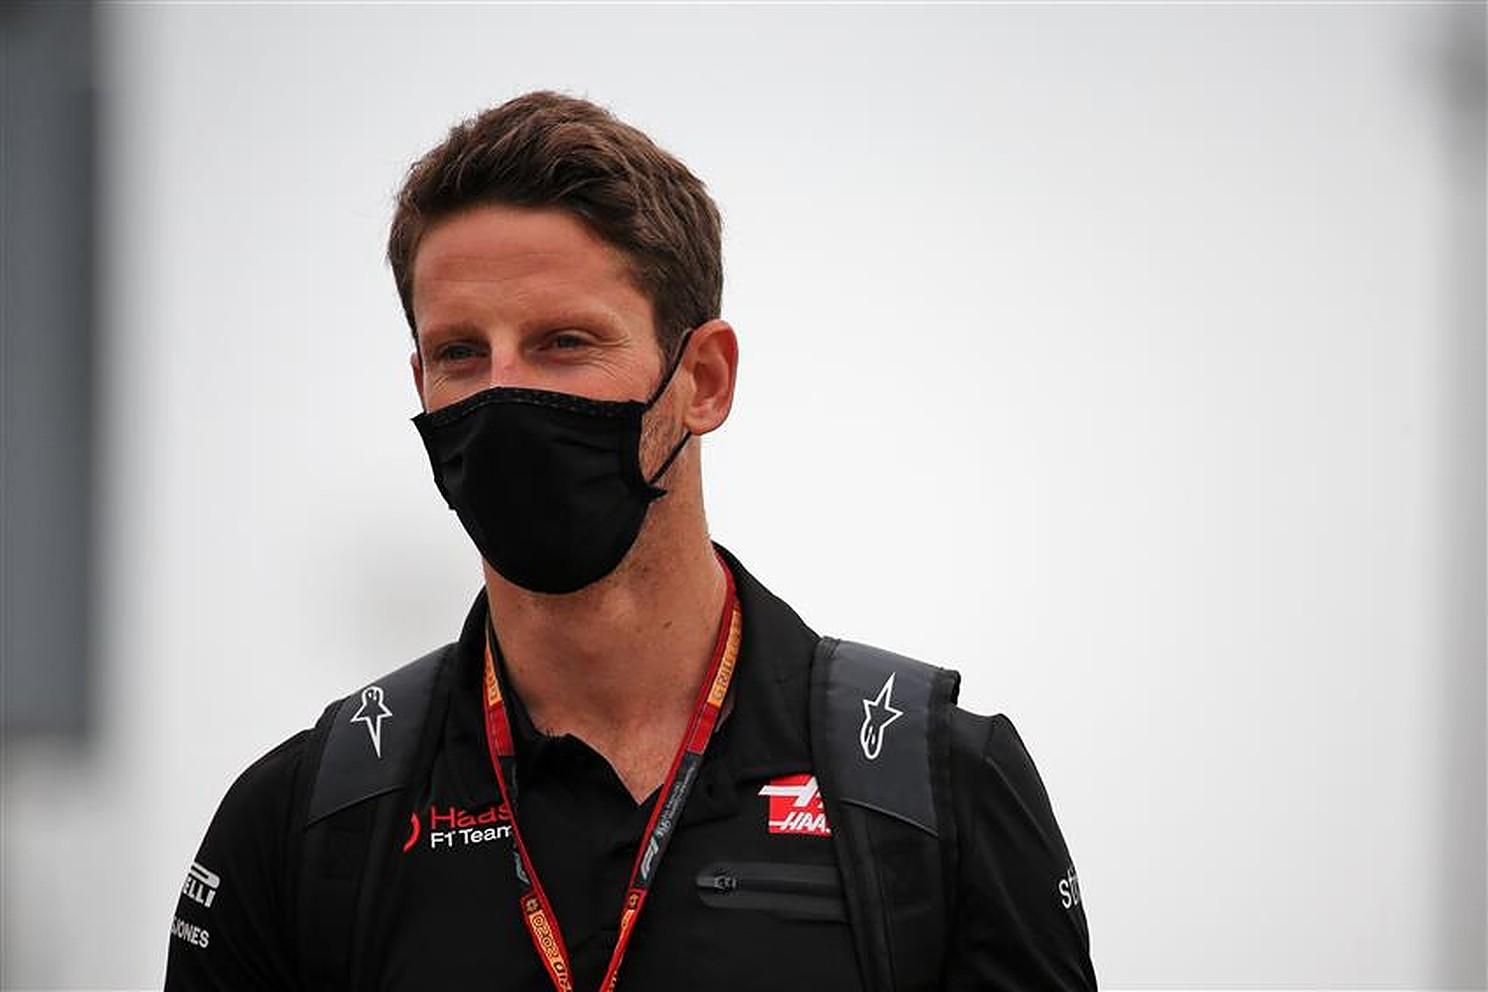 Romain Grosjean set to join IndyCar team in 2021 - Formula1news.co.uk